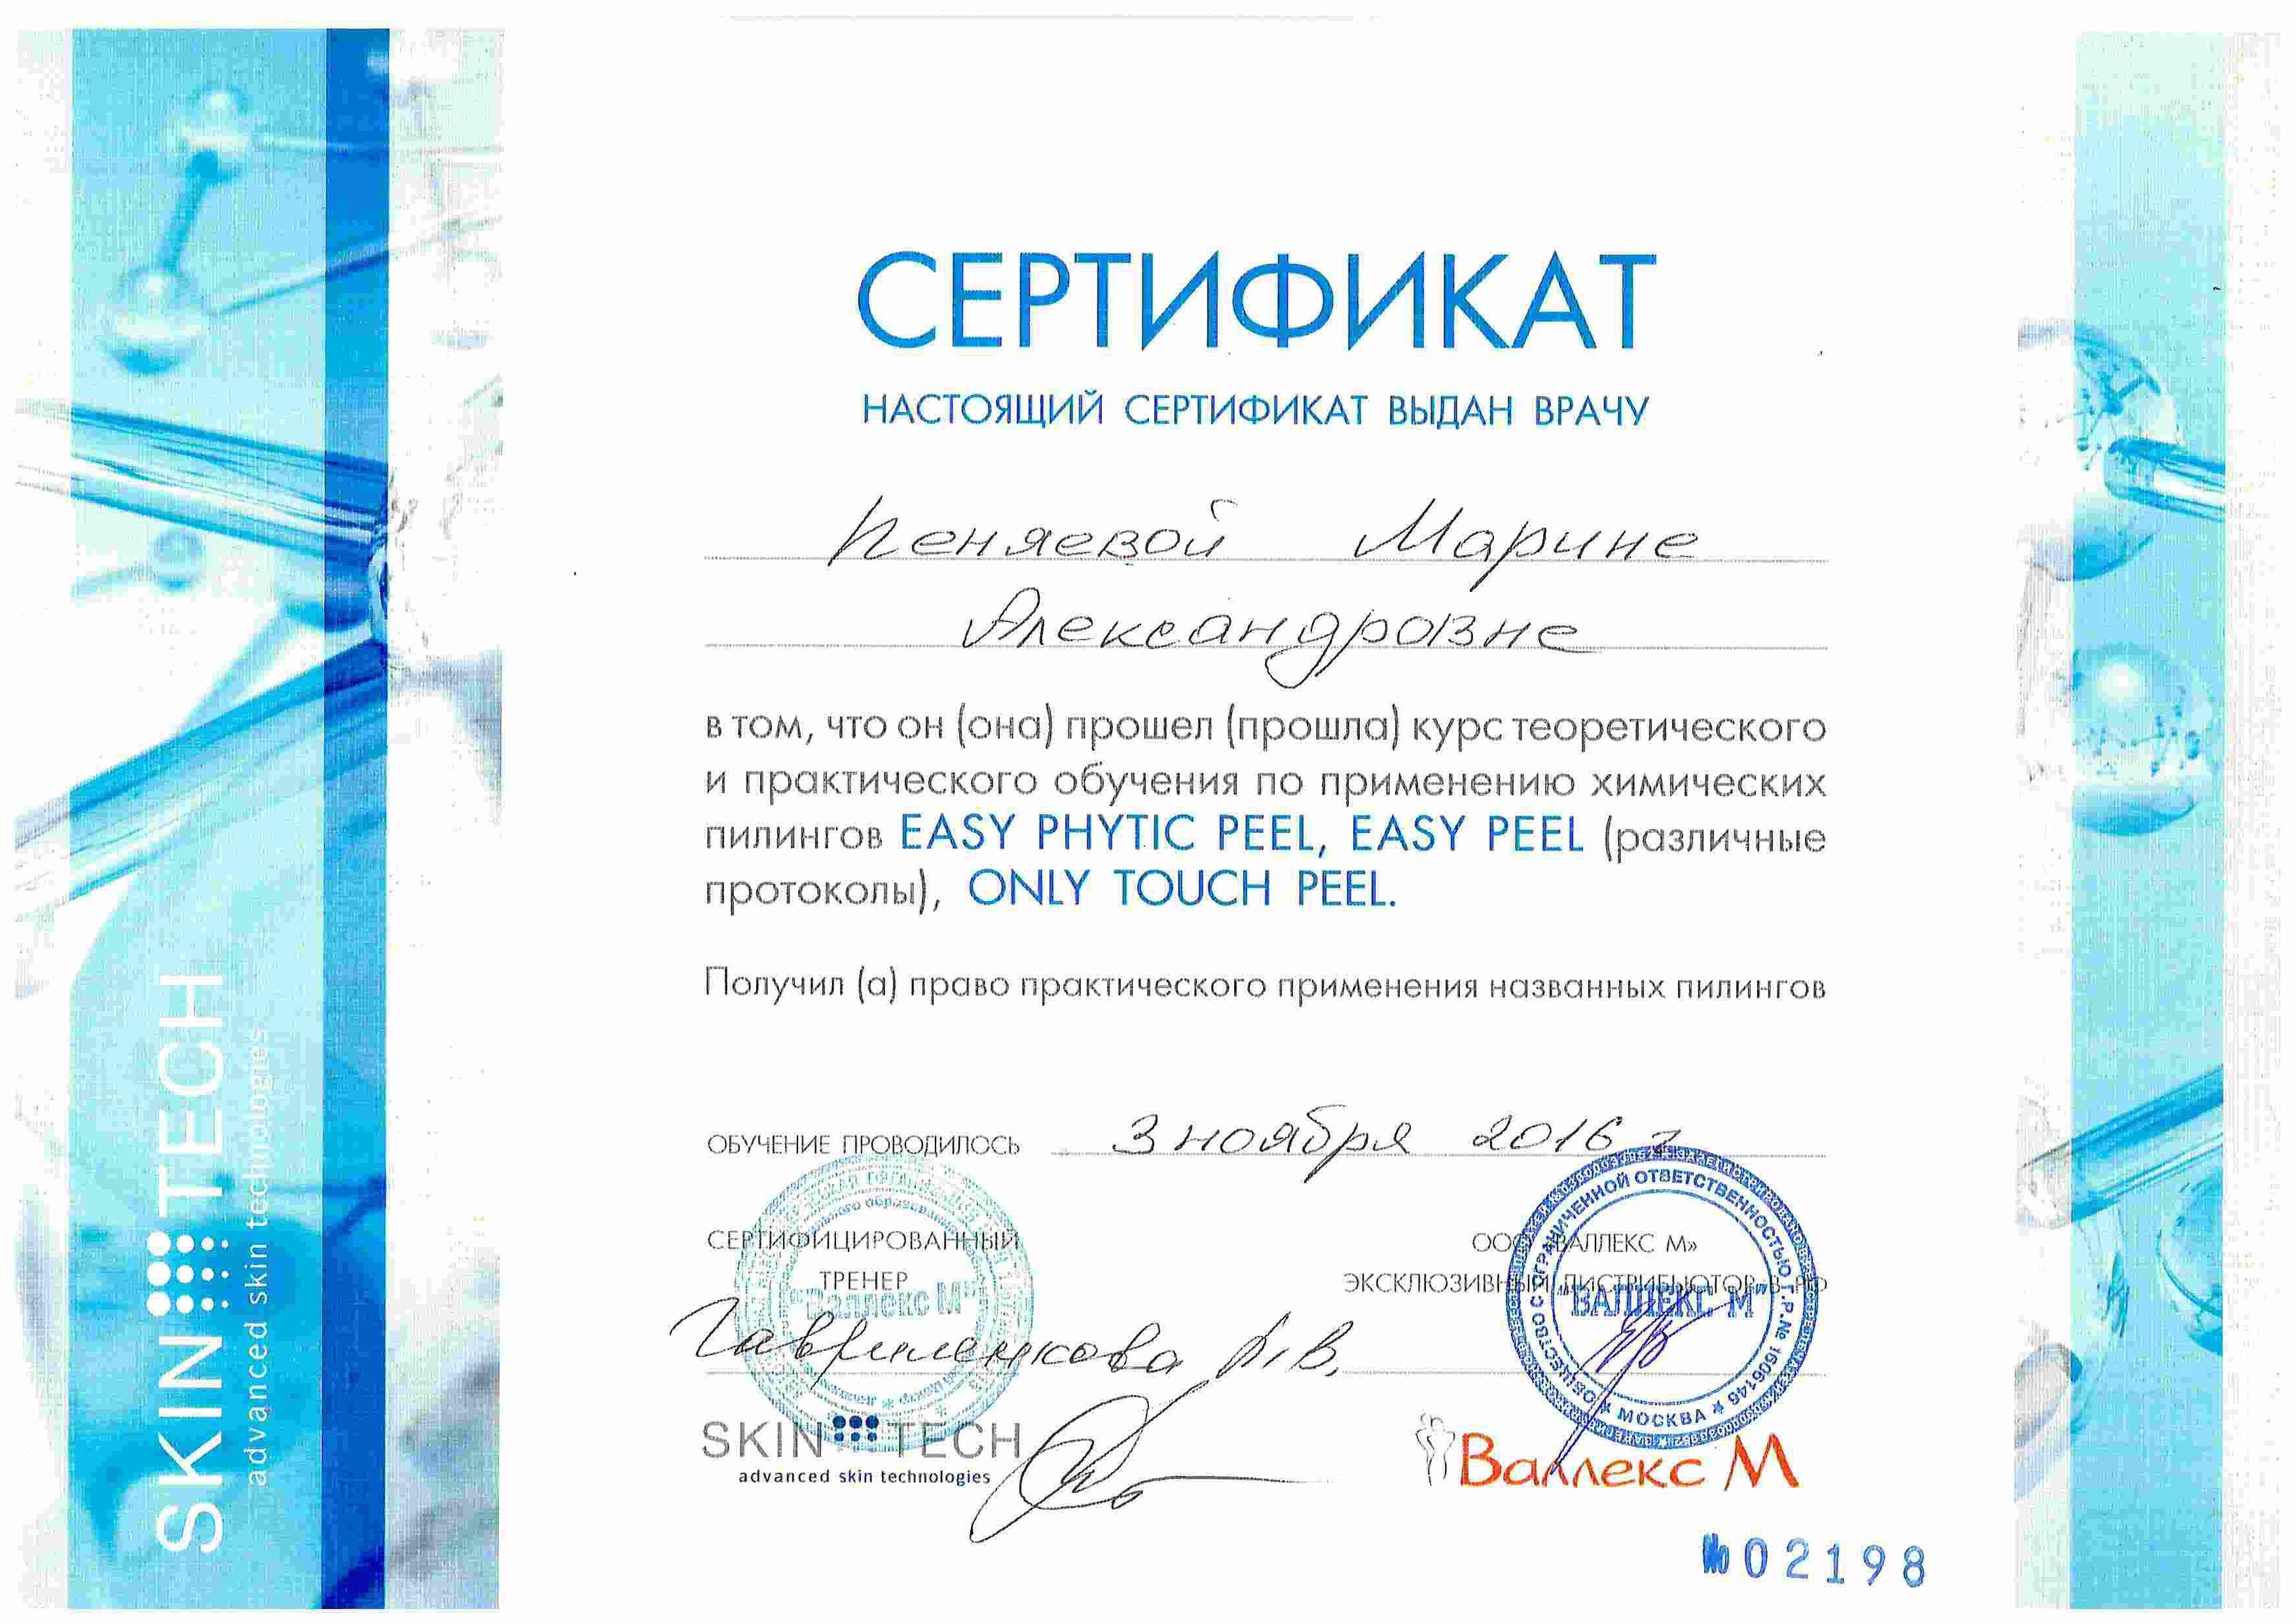 Сертификат Пеняева 2